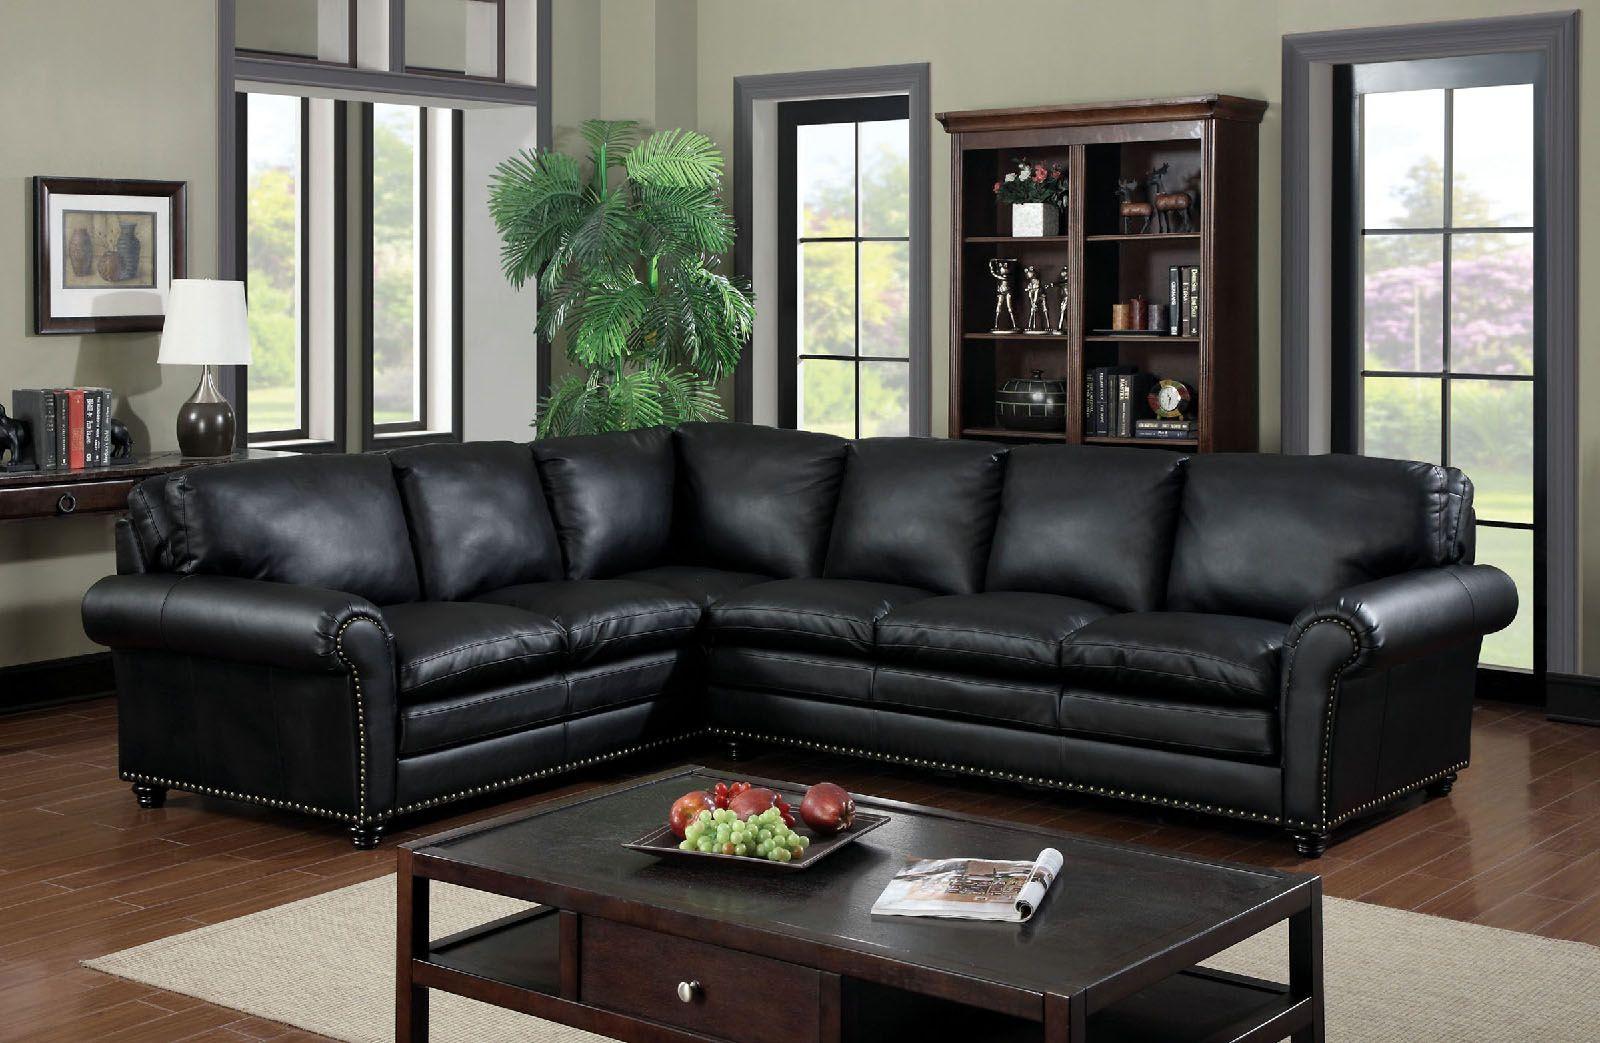 Payette 6808 Black Nailhead Trim Sectional Sofa Leather Sectional Living Room Living Room Sectional Sectional Sofa Comfy